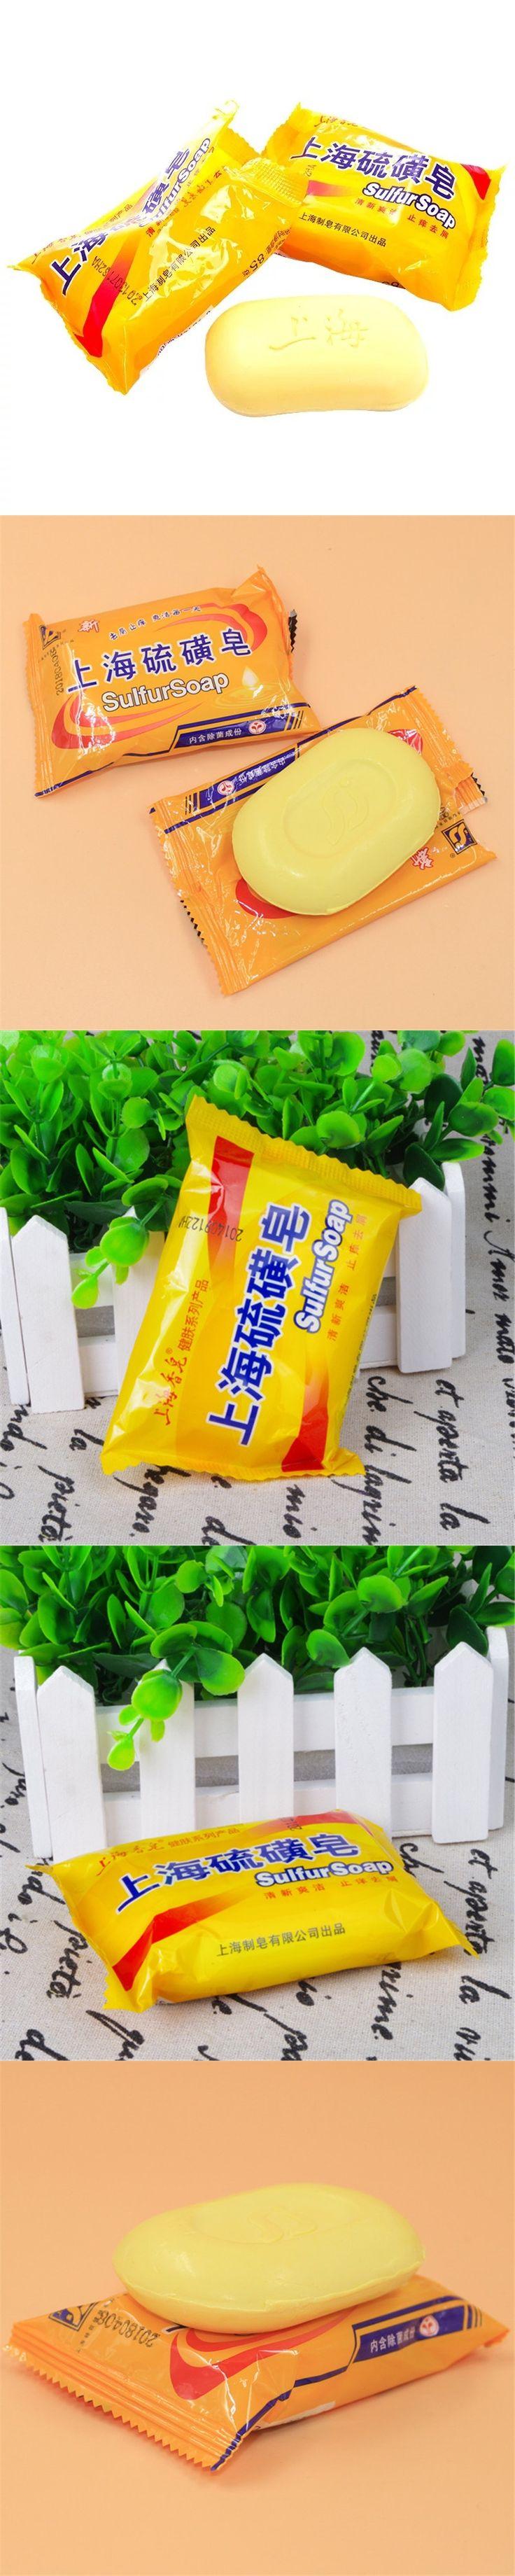 5 pcs  Shanghai Sulfur Soap Acne Psoriasis 4 Skin Conditions  Seborrhea Eczema Anti Fungus Perfume Butter Bubble Bath 85g